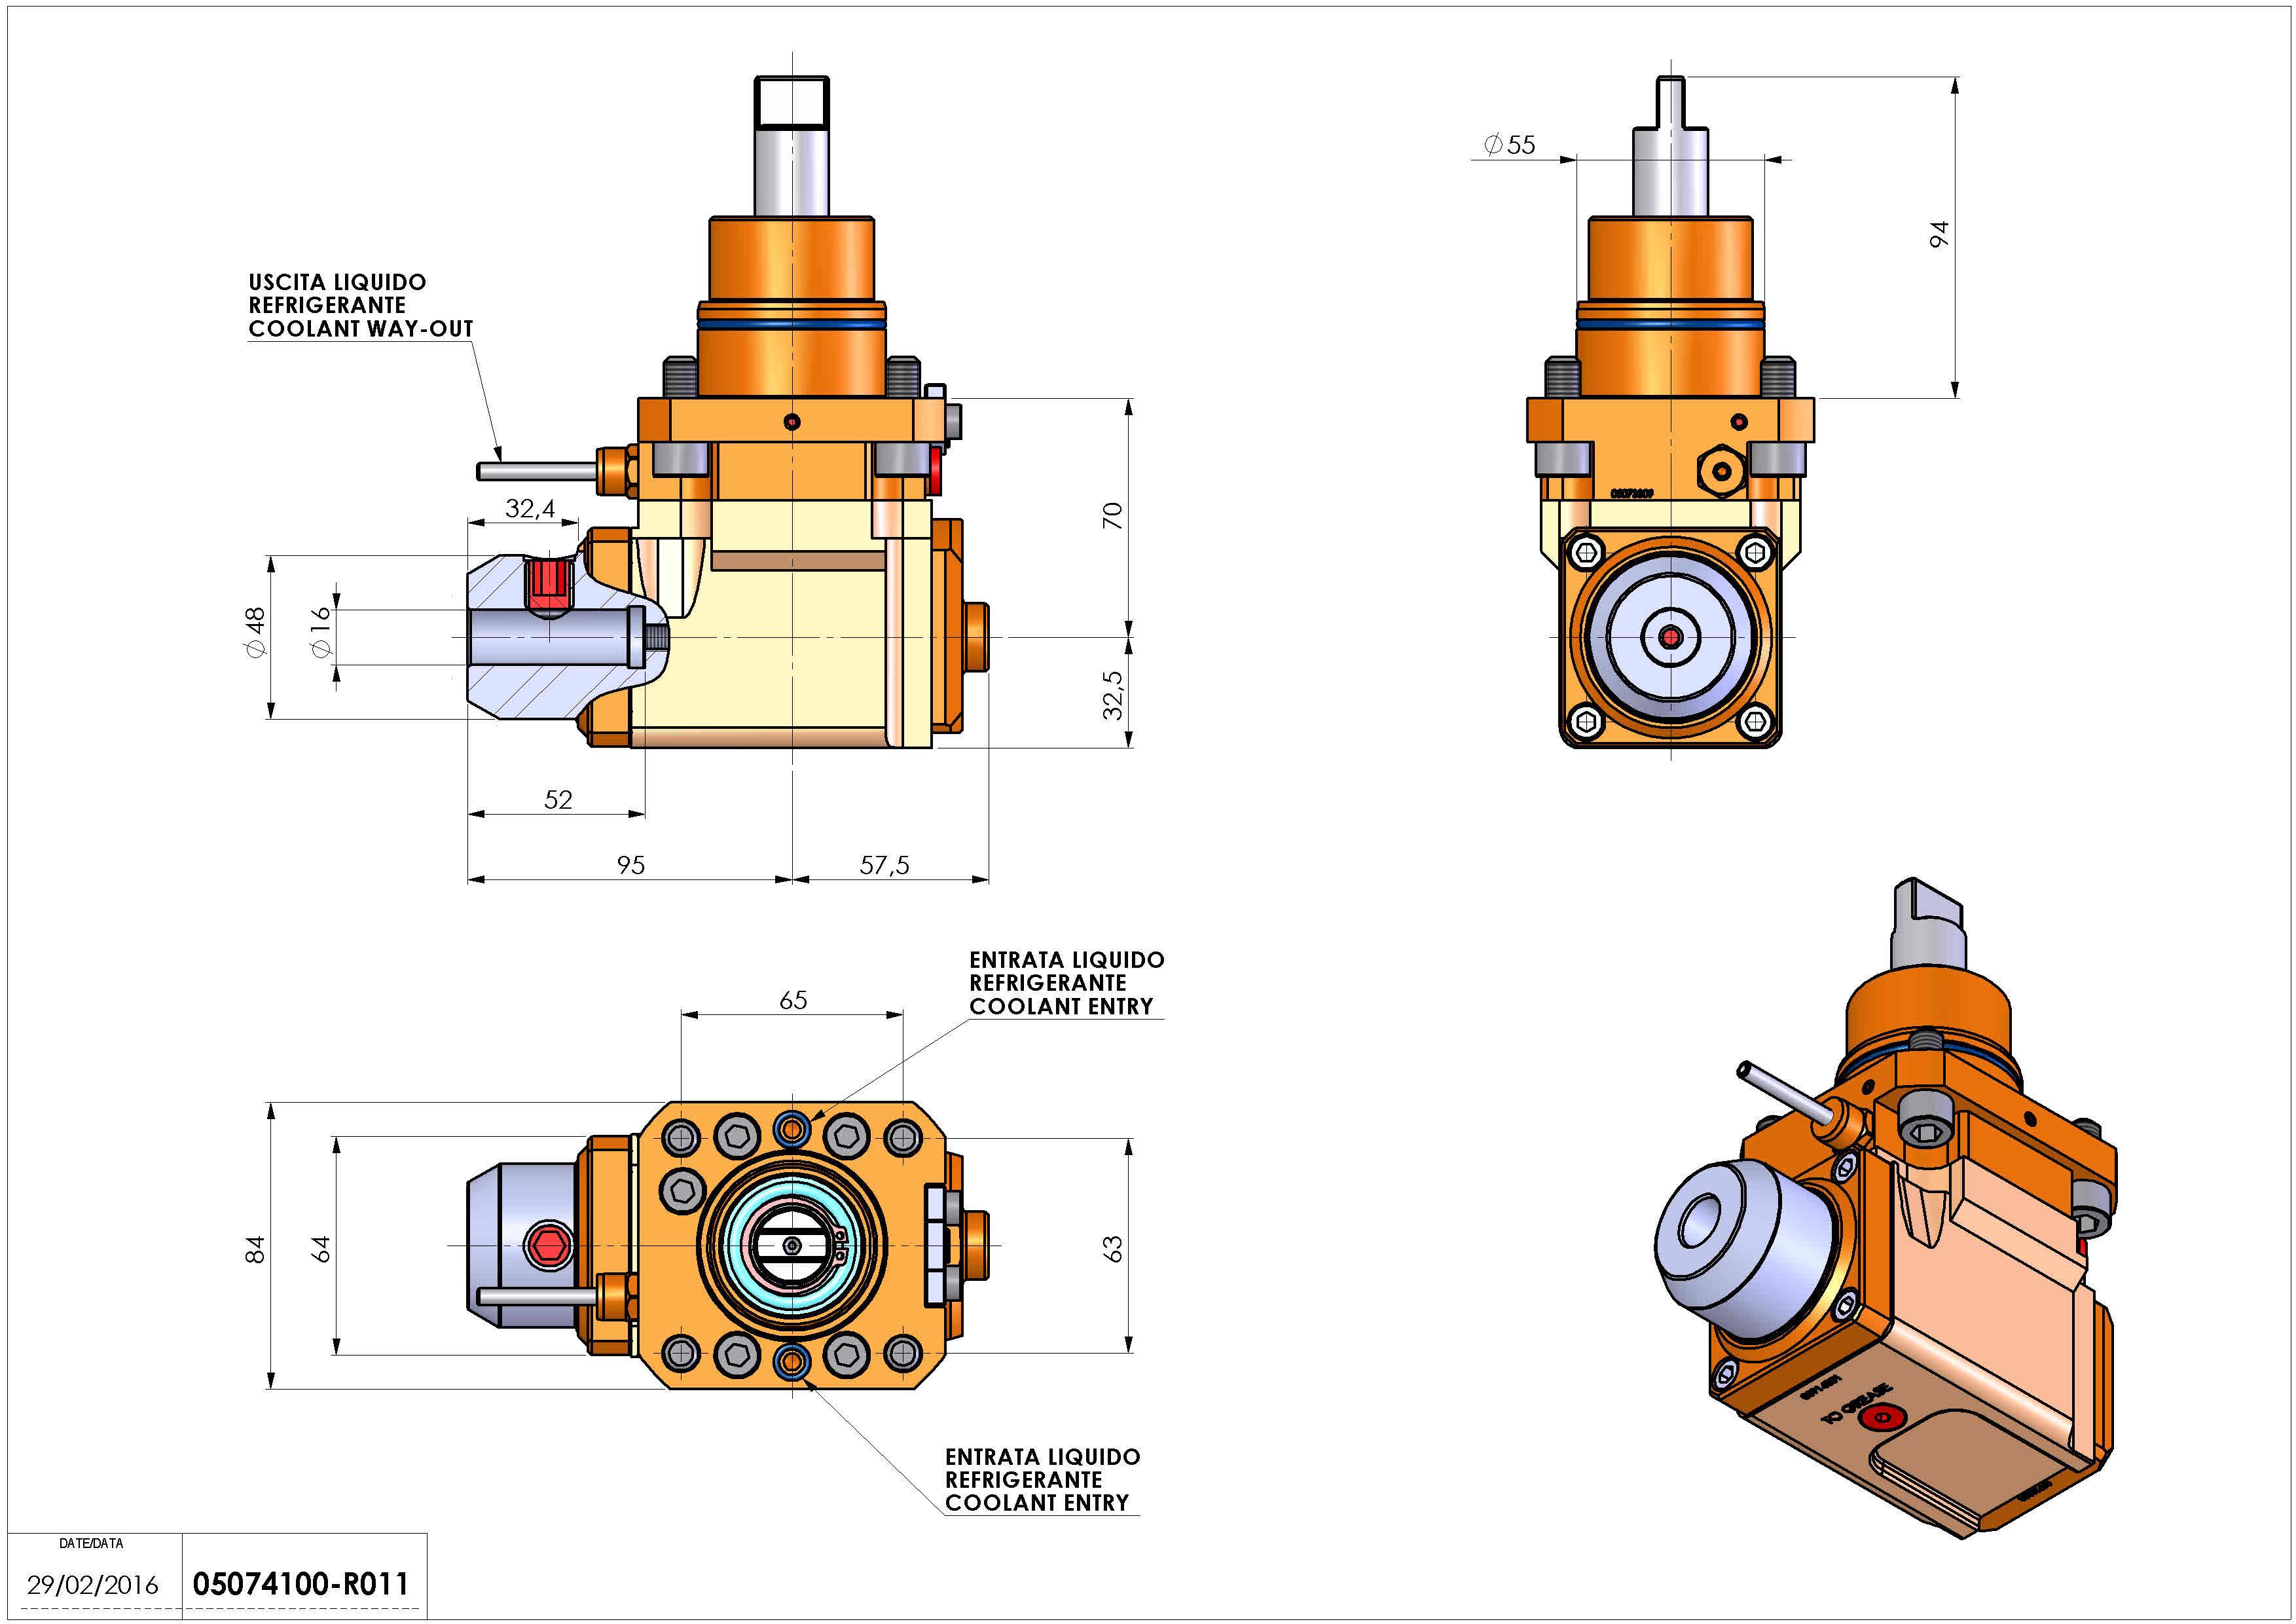 Technical image - LT-A D55 WELDON-16 LR H70 BI.